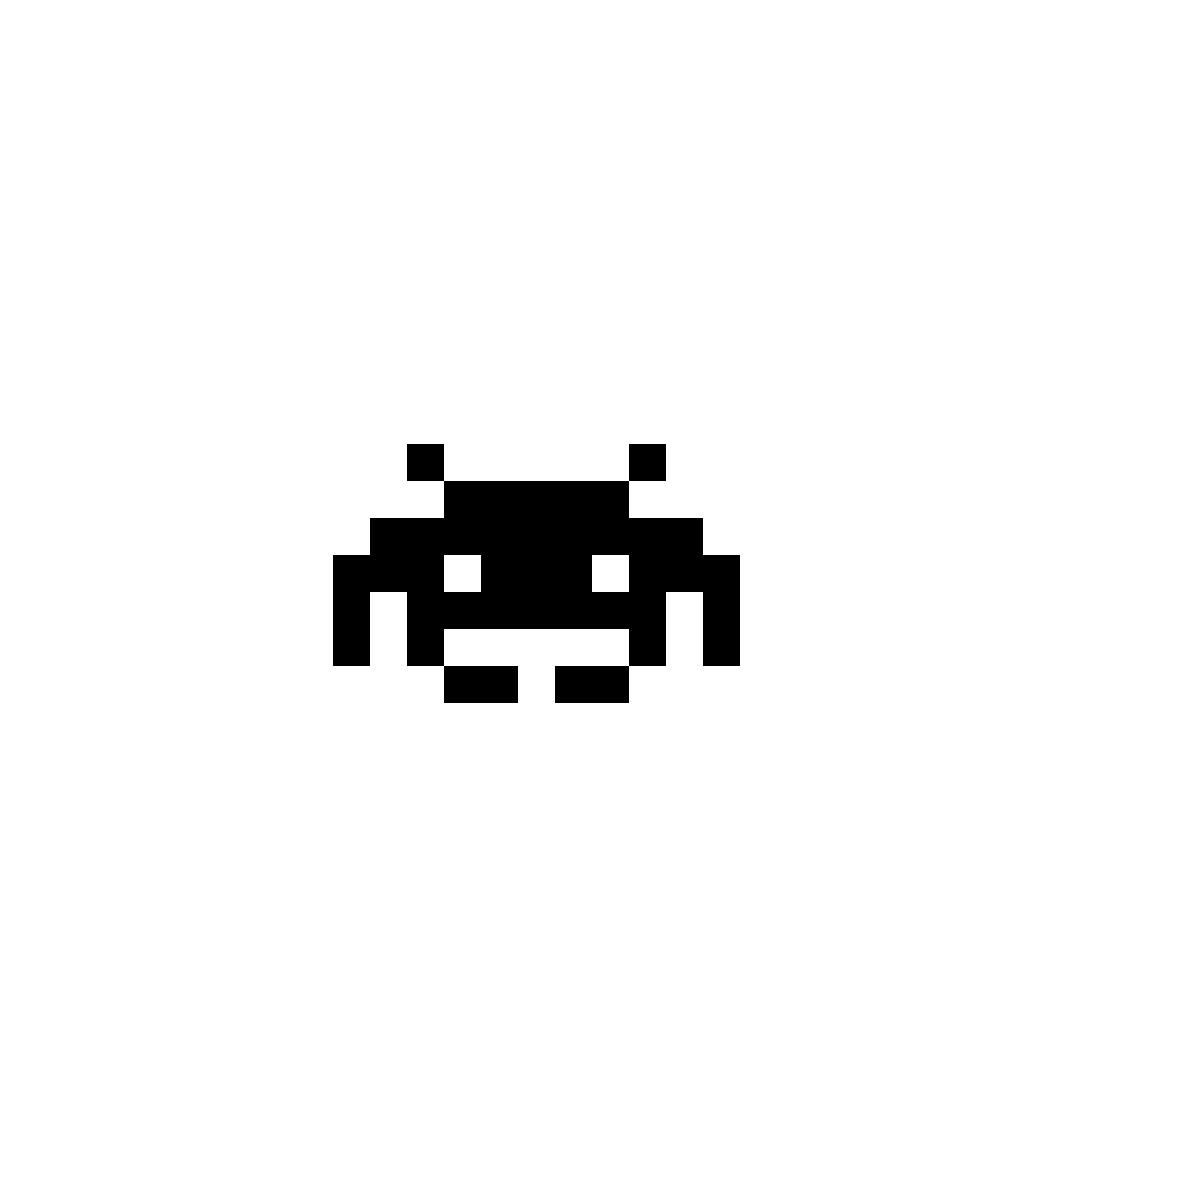 Pixilart Android Symbol By Izaiahs176